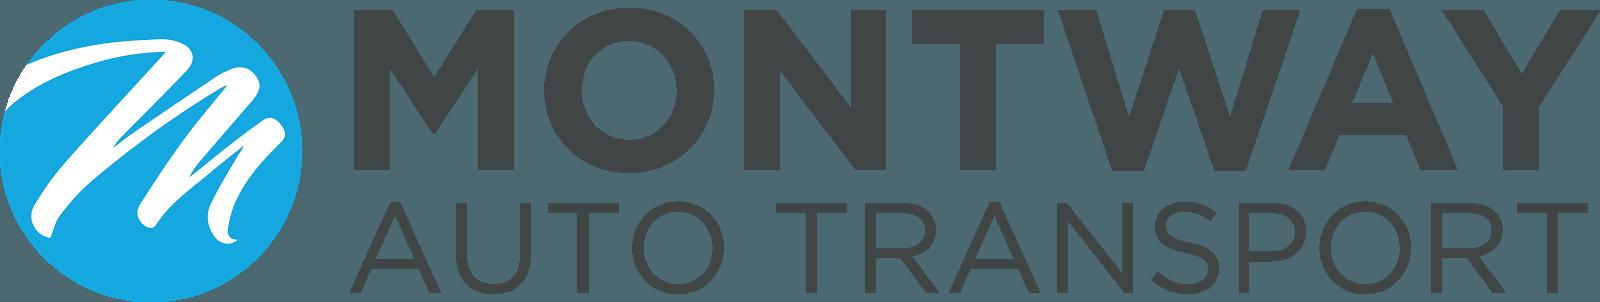 Montway Auto Transport Logo